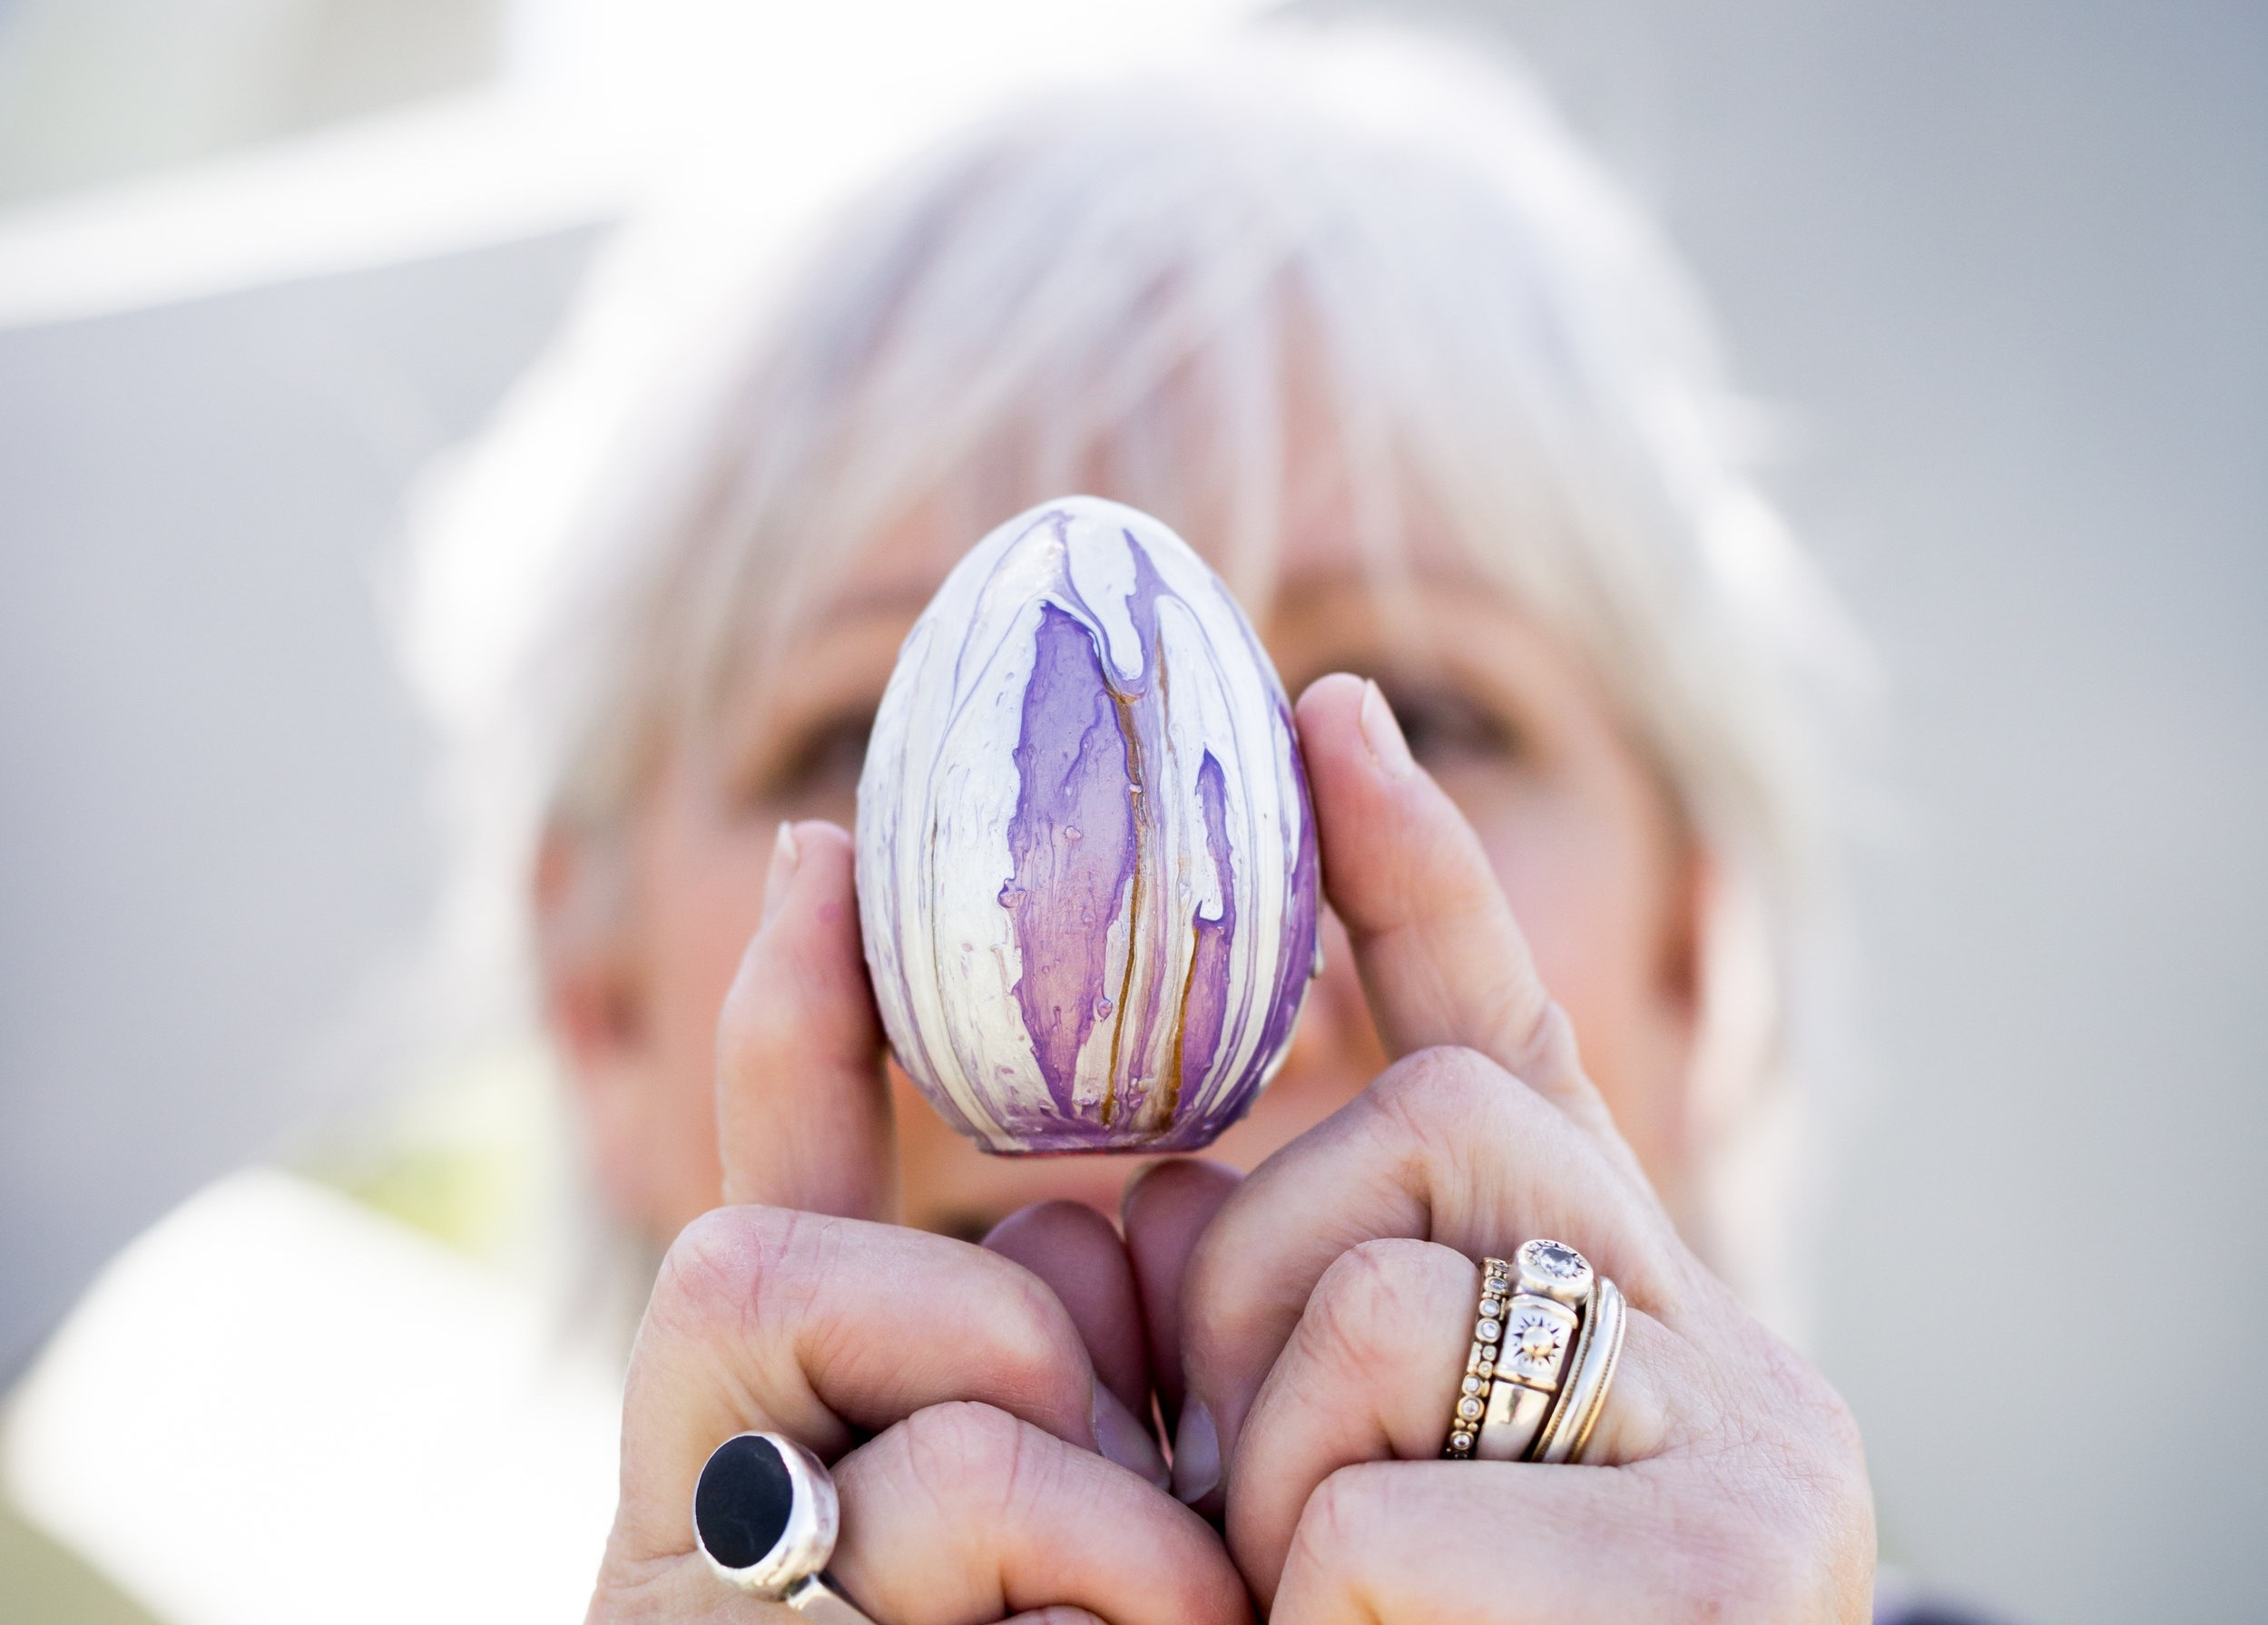 SCHEDULE - 2 p.m. - 4 p.m.Adult Egg Hunt at Sculpture Fields4p.m. - 6 p.m.Hoppy Hour at various local restaurants